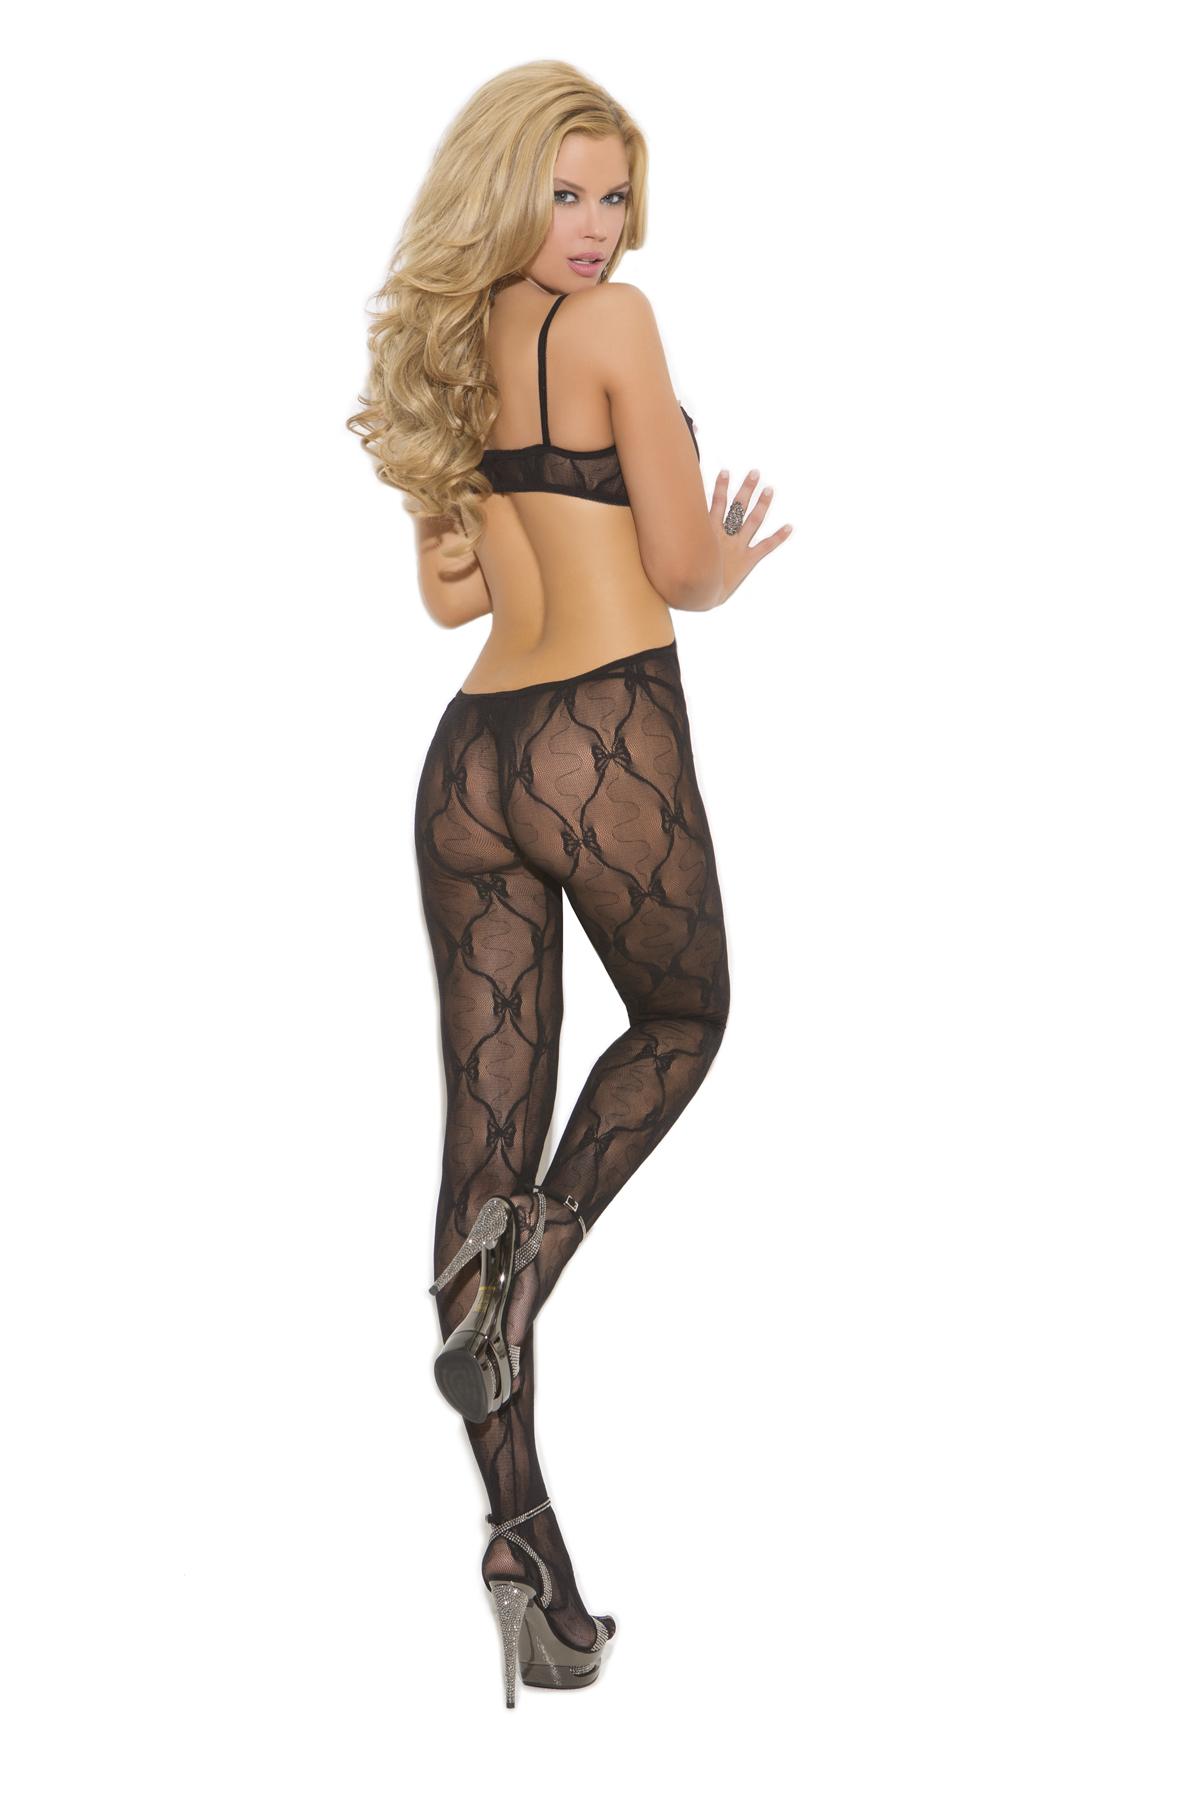 Bow Tie Lace Bodystocking Plus Size